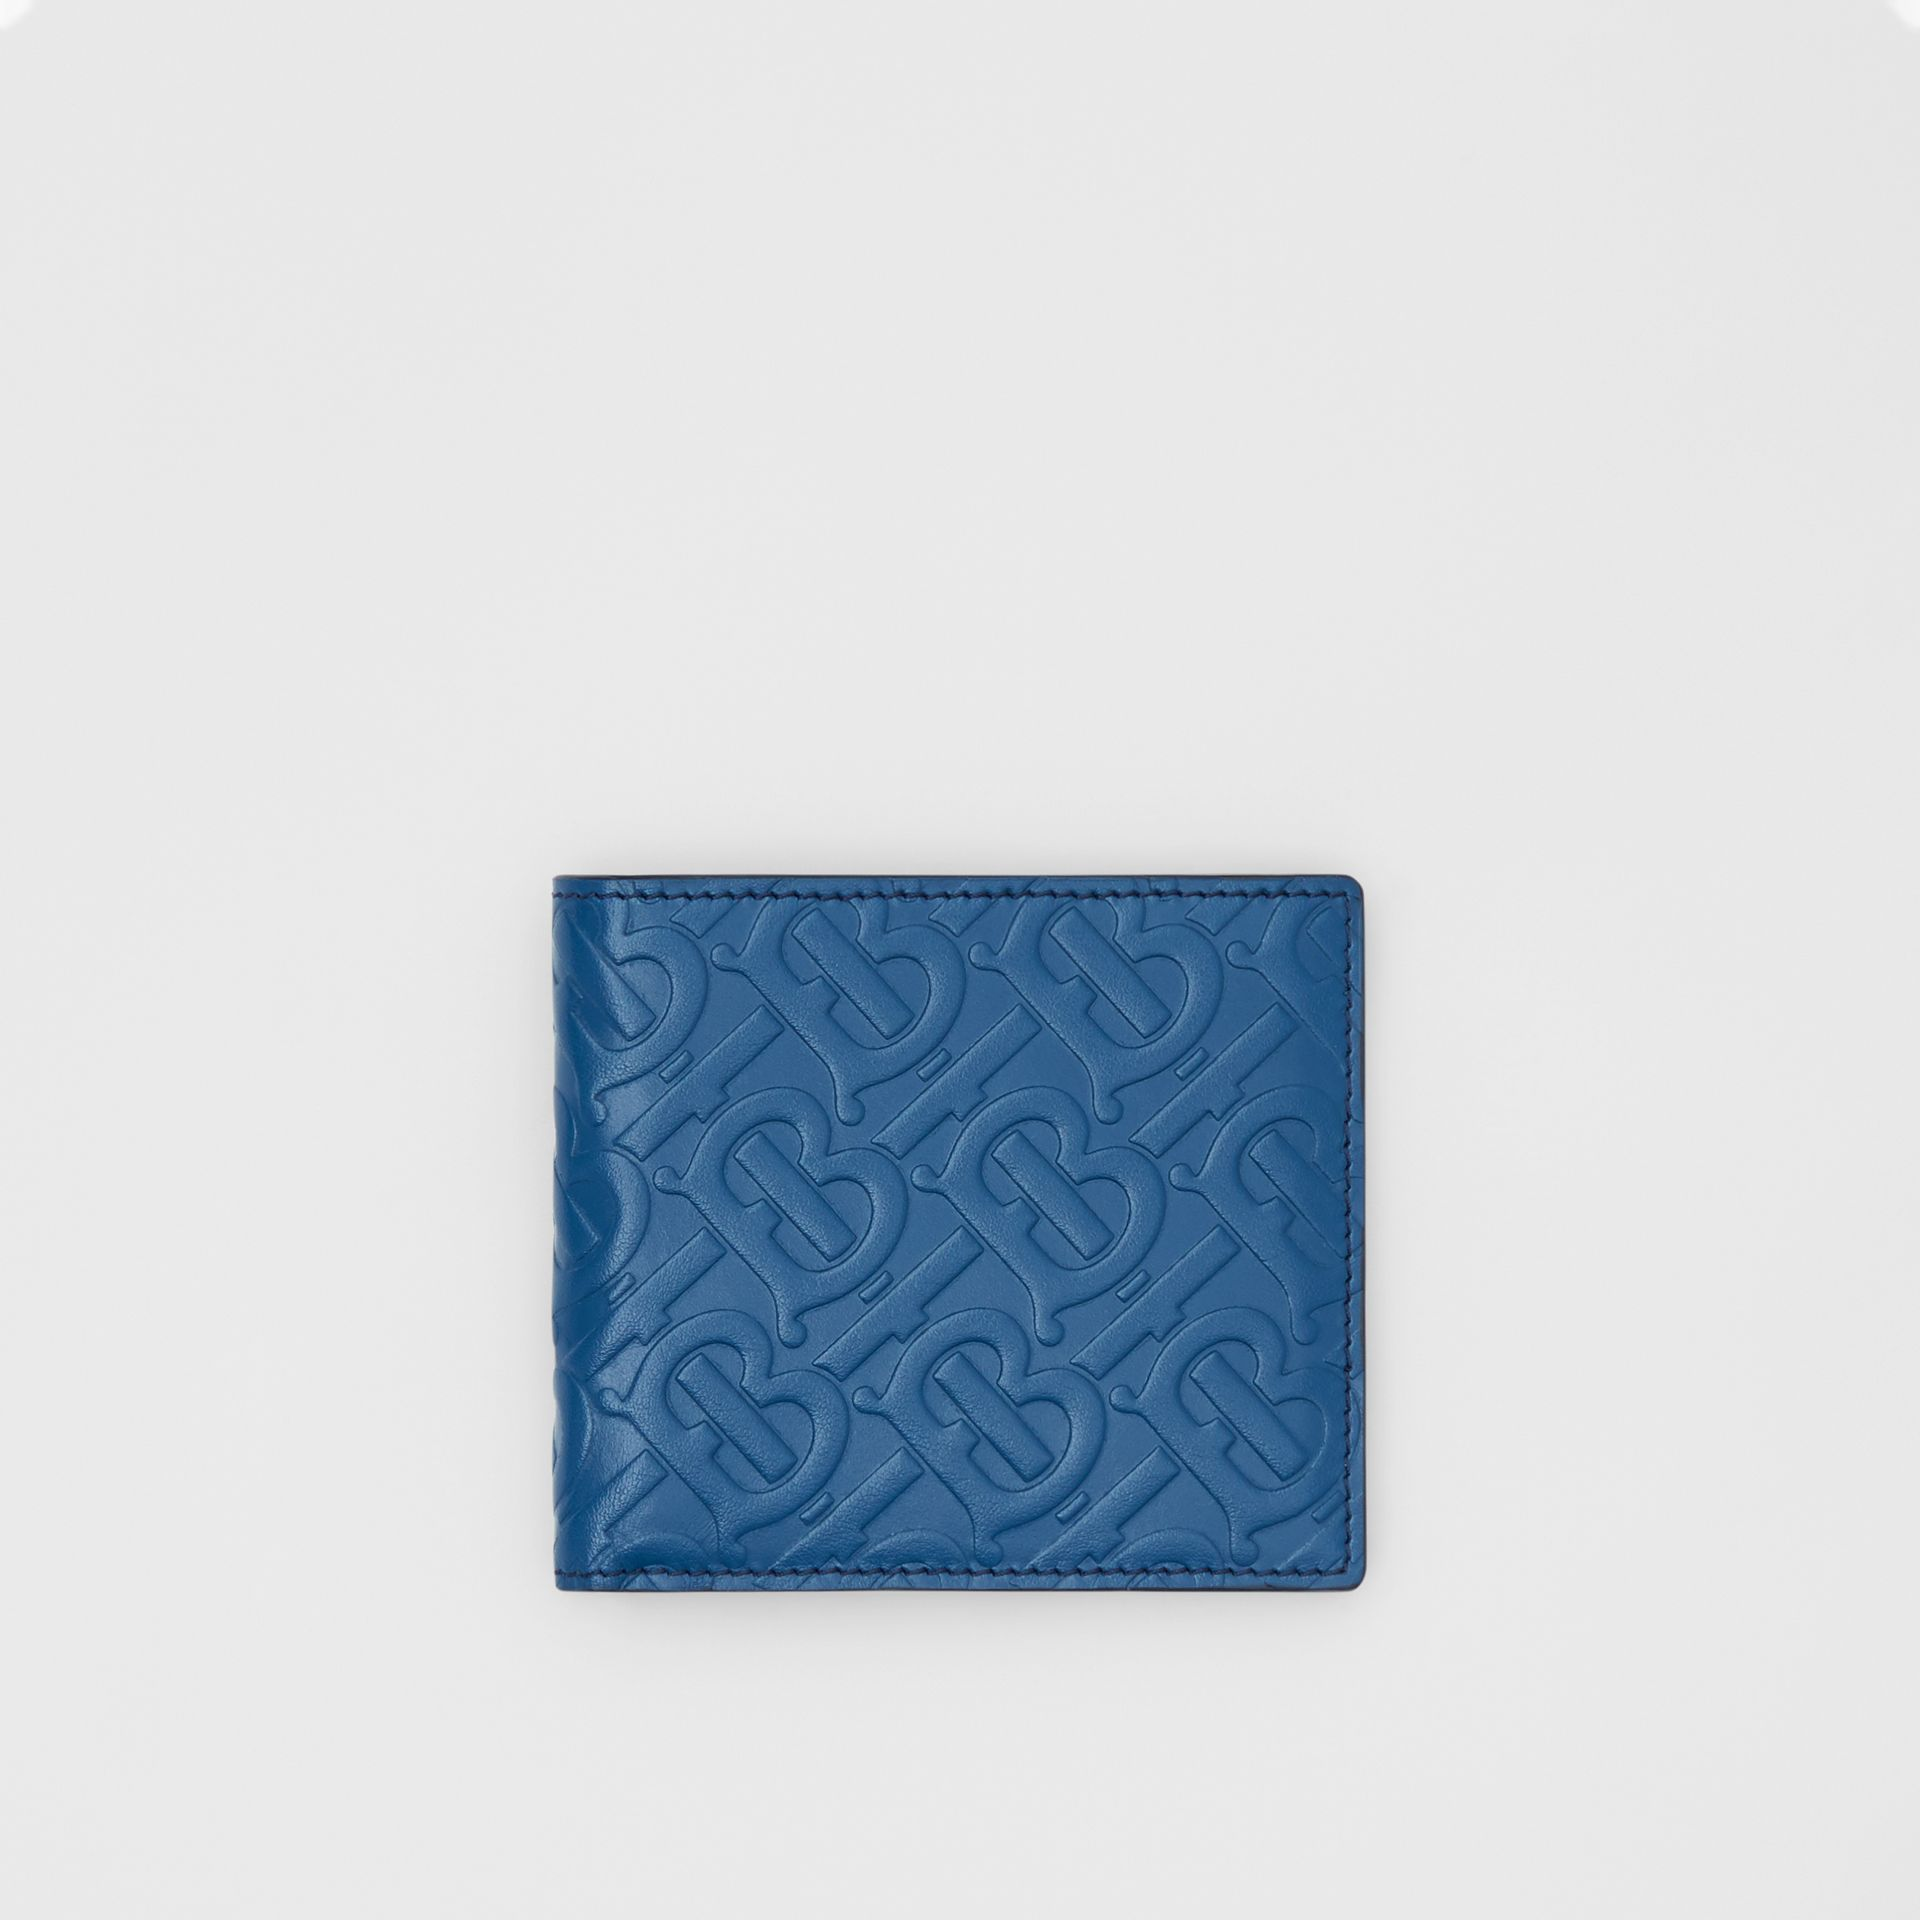 Monogram Leather International Bifold Wallet in Pale Canvas Blue - Men   Burberry - gallery image 0